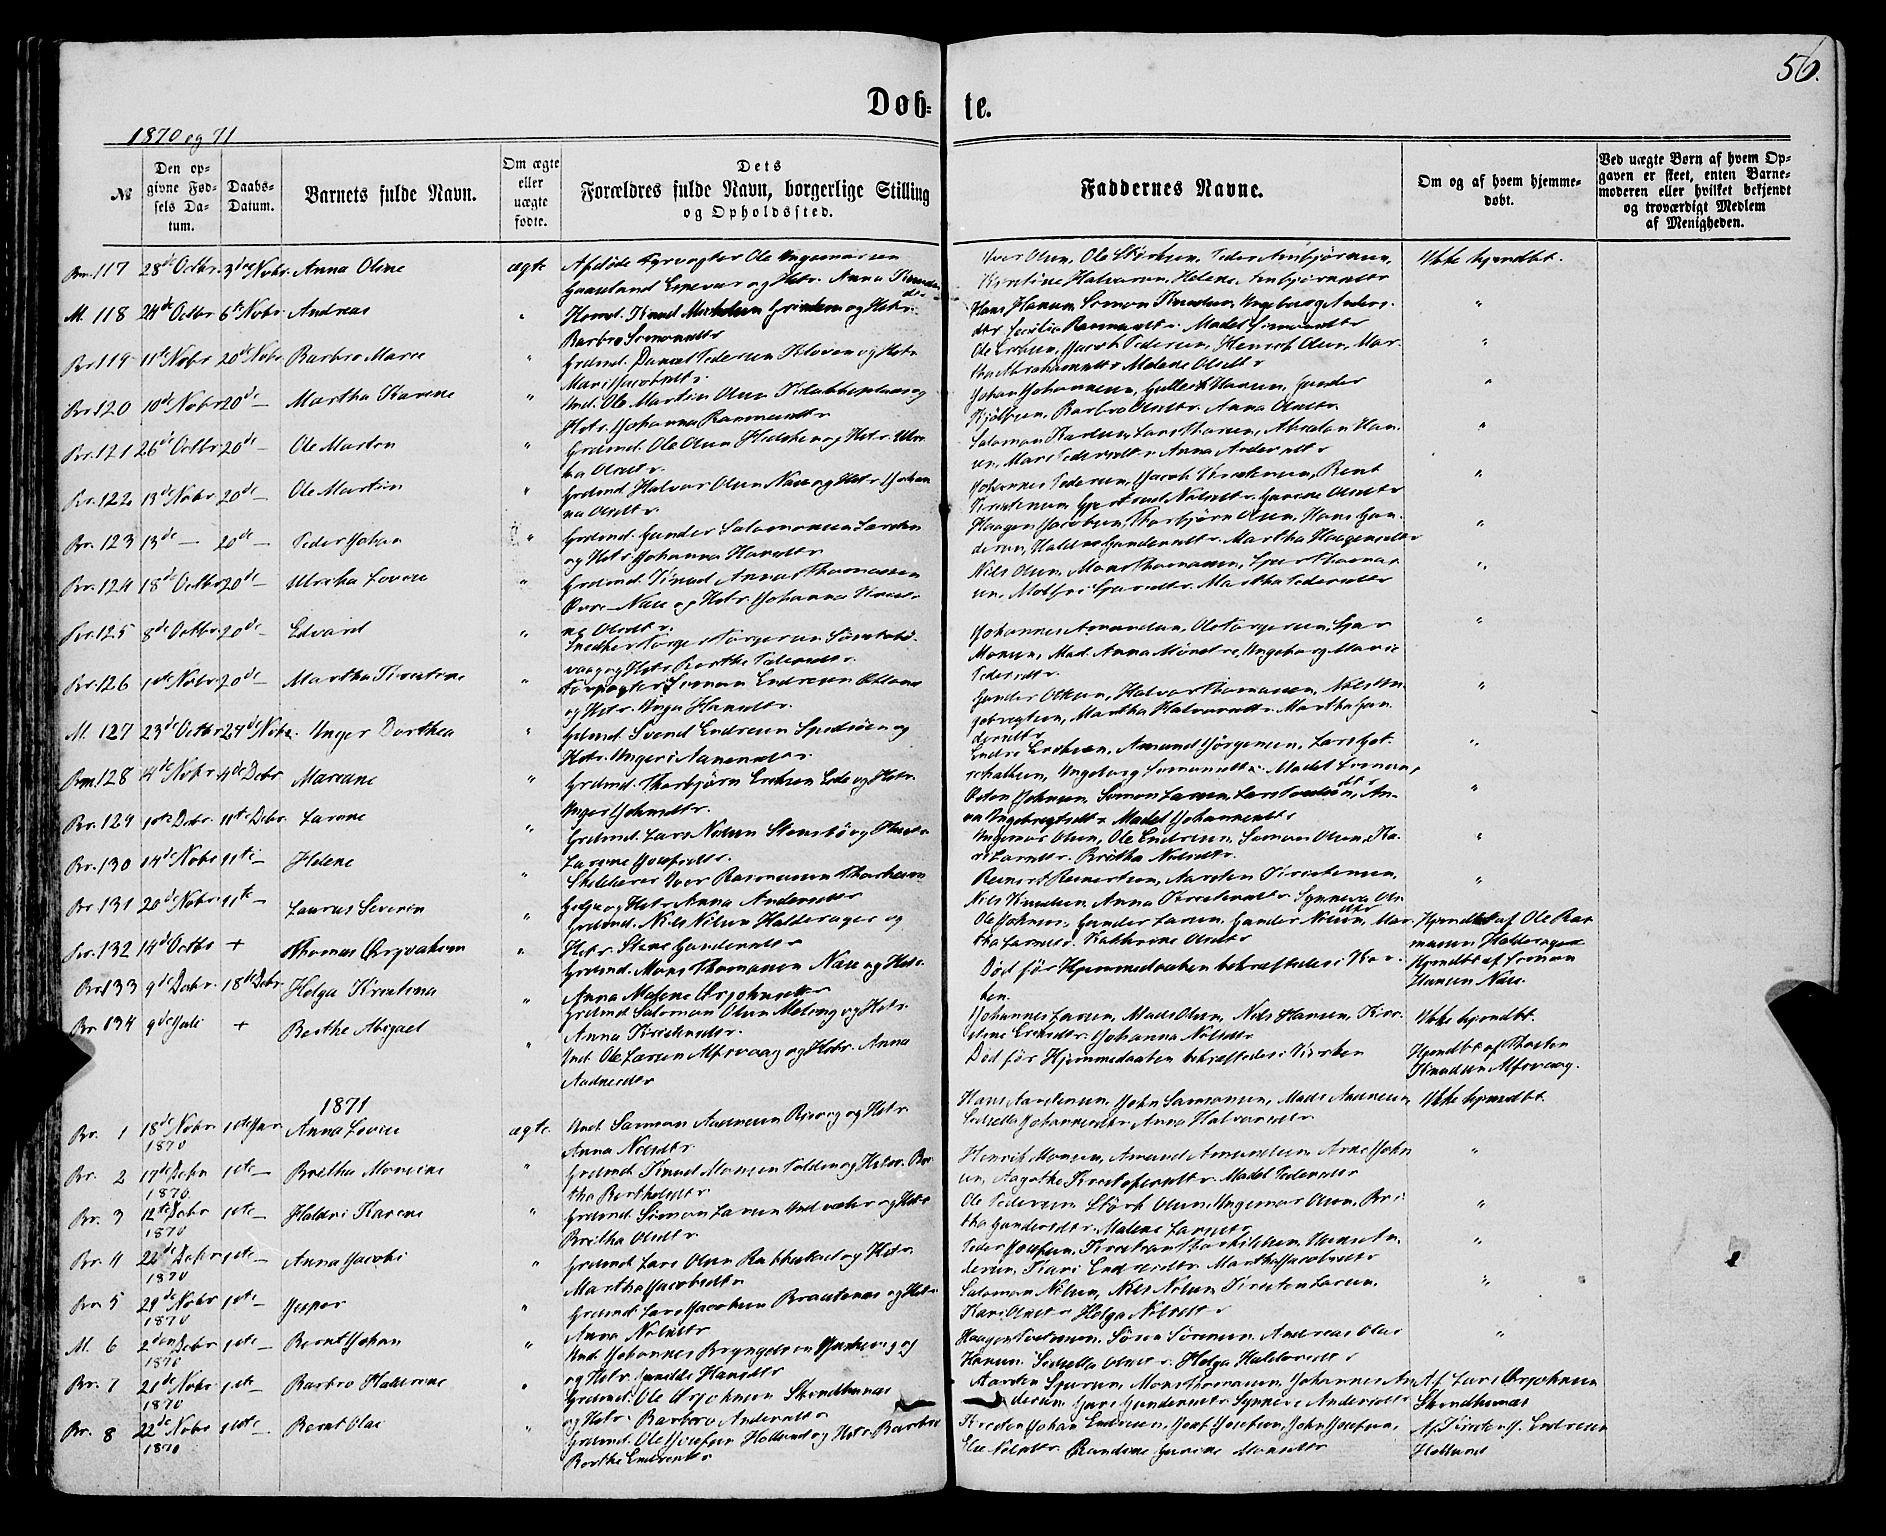 SAB, Finnås sokneprestembete, H/Ha/Haa/Haaa/L0008: Ministerialbok nr. A 8, 1863-1872, s. 56